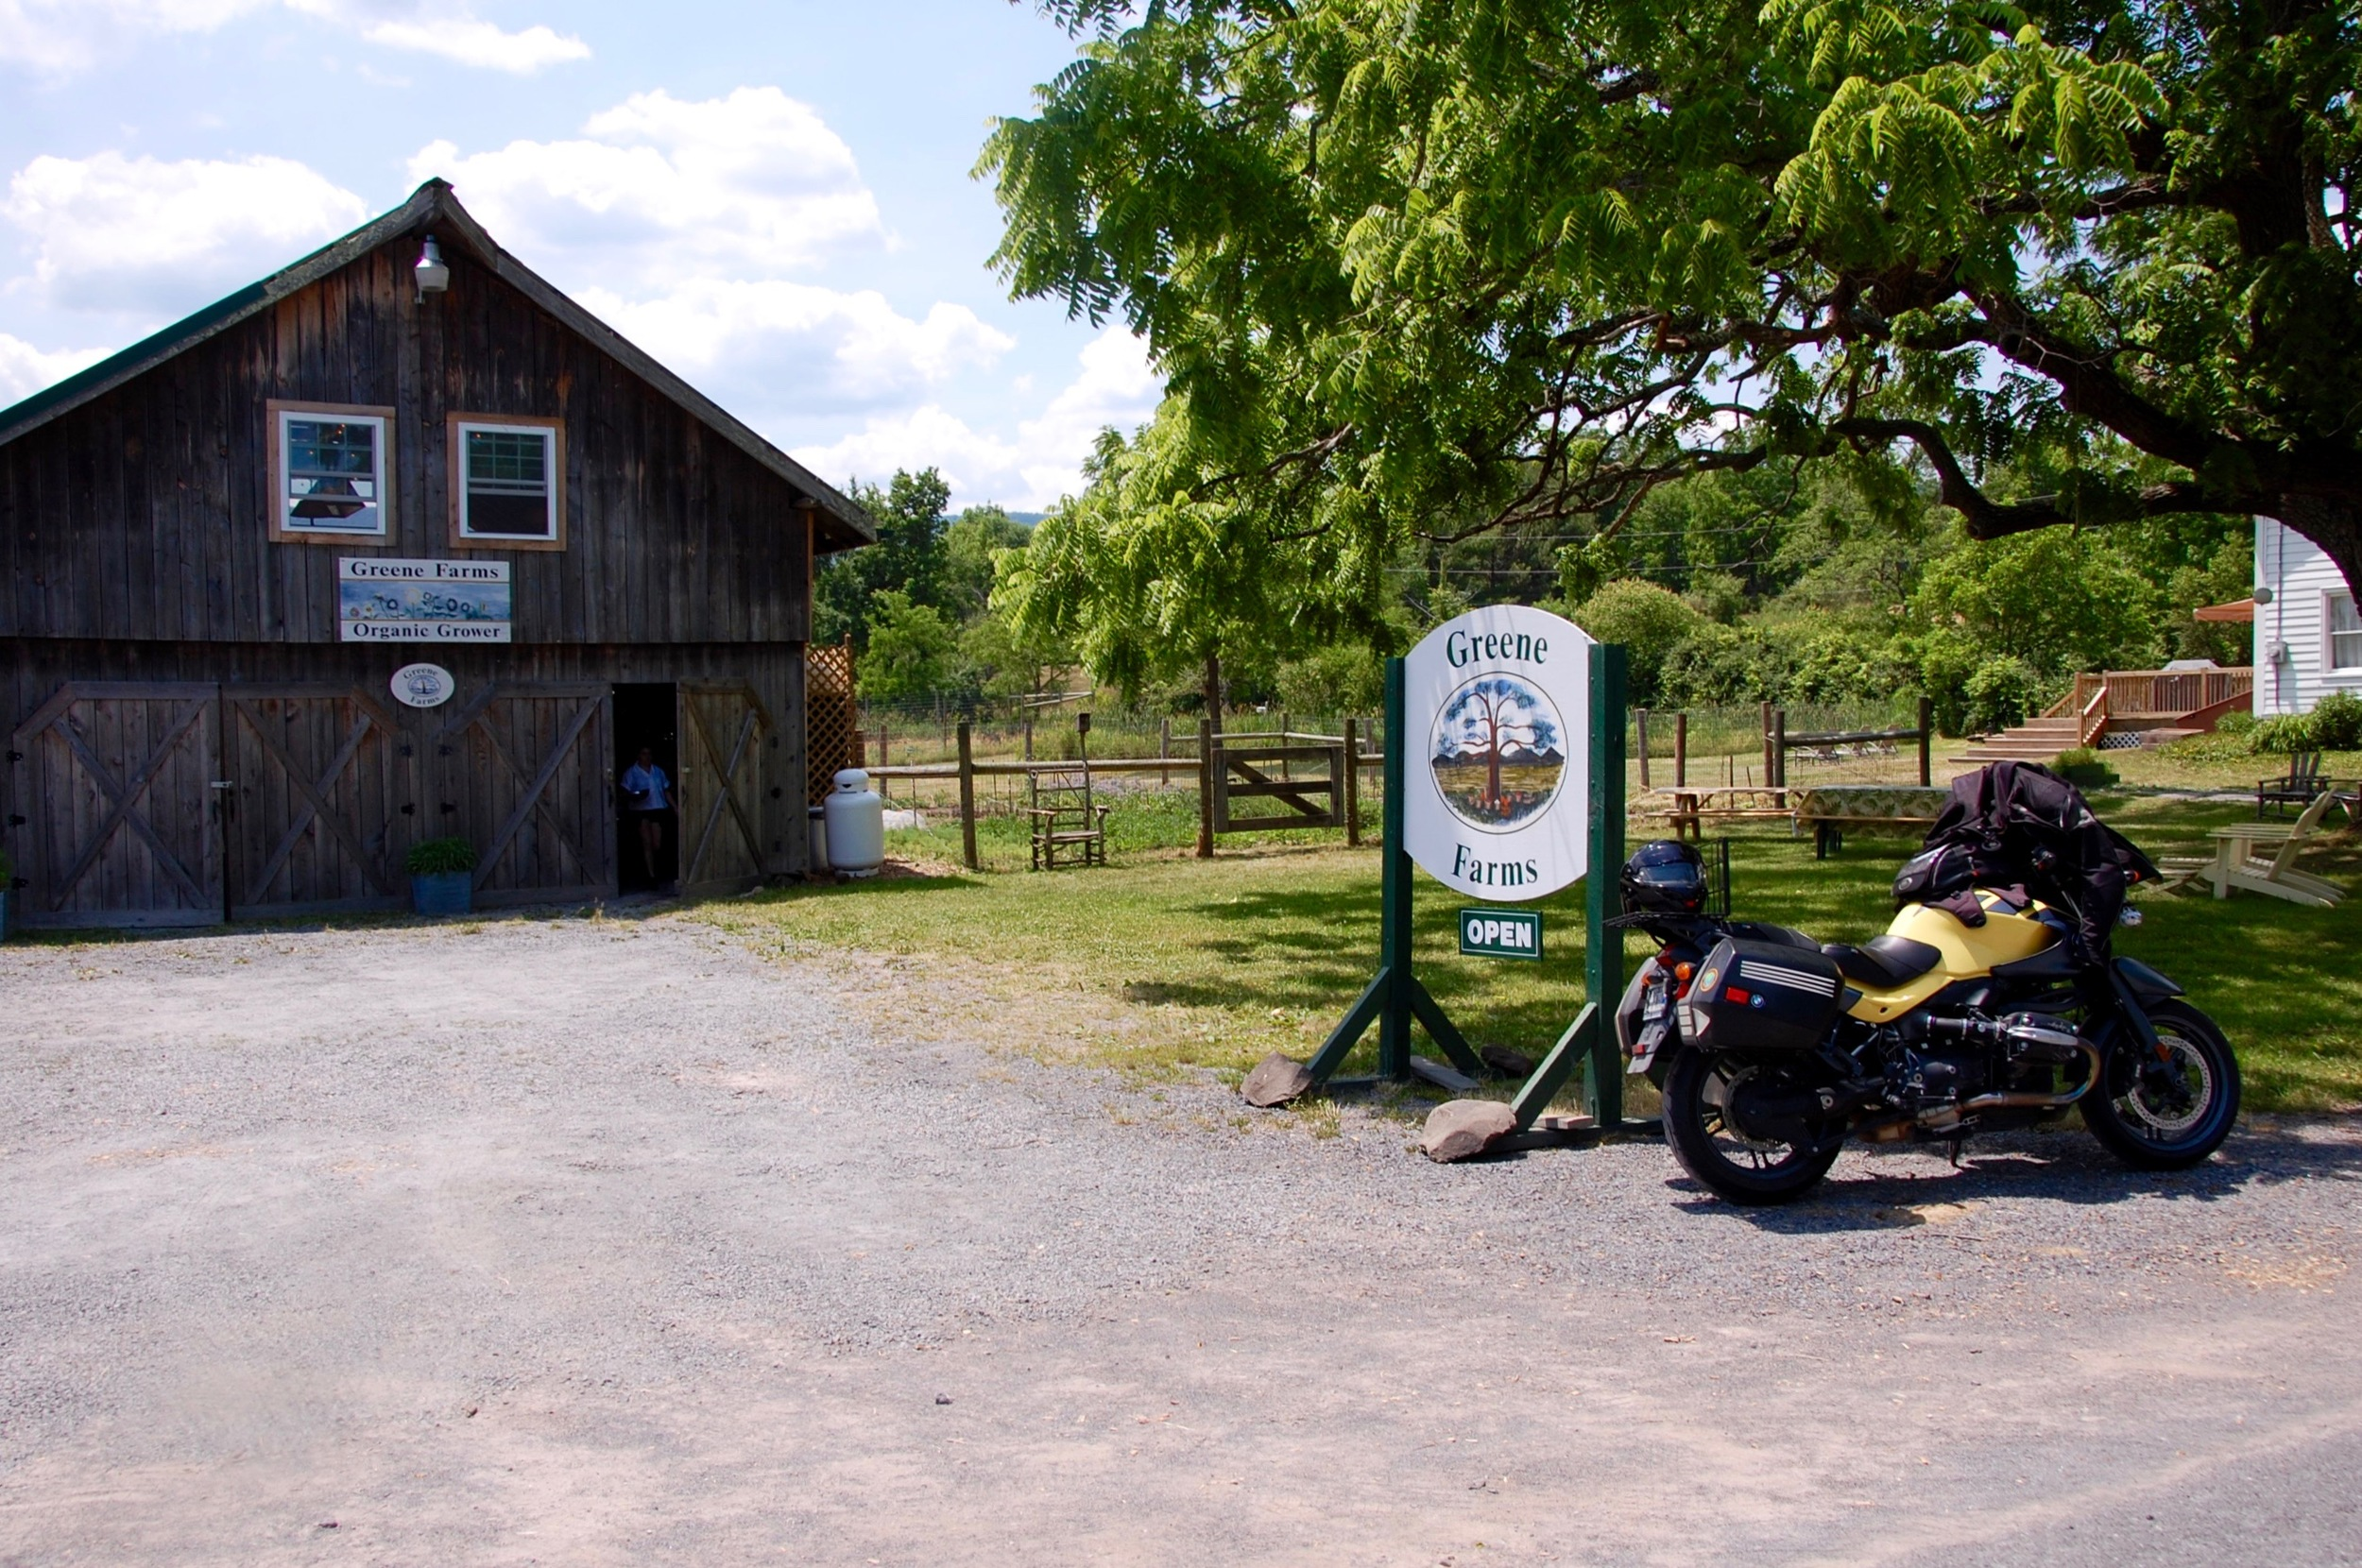 Greene Farms Organic Farm Cornwallville NY